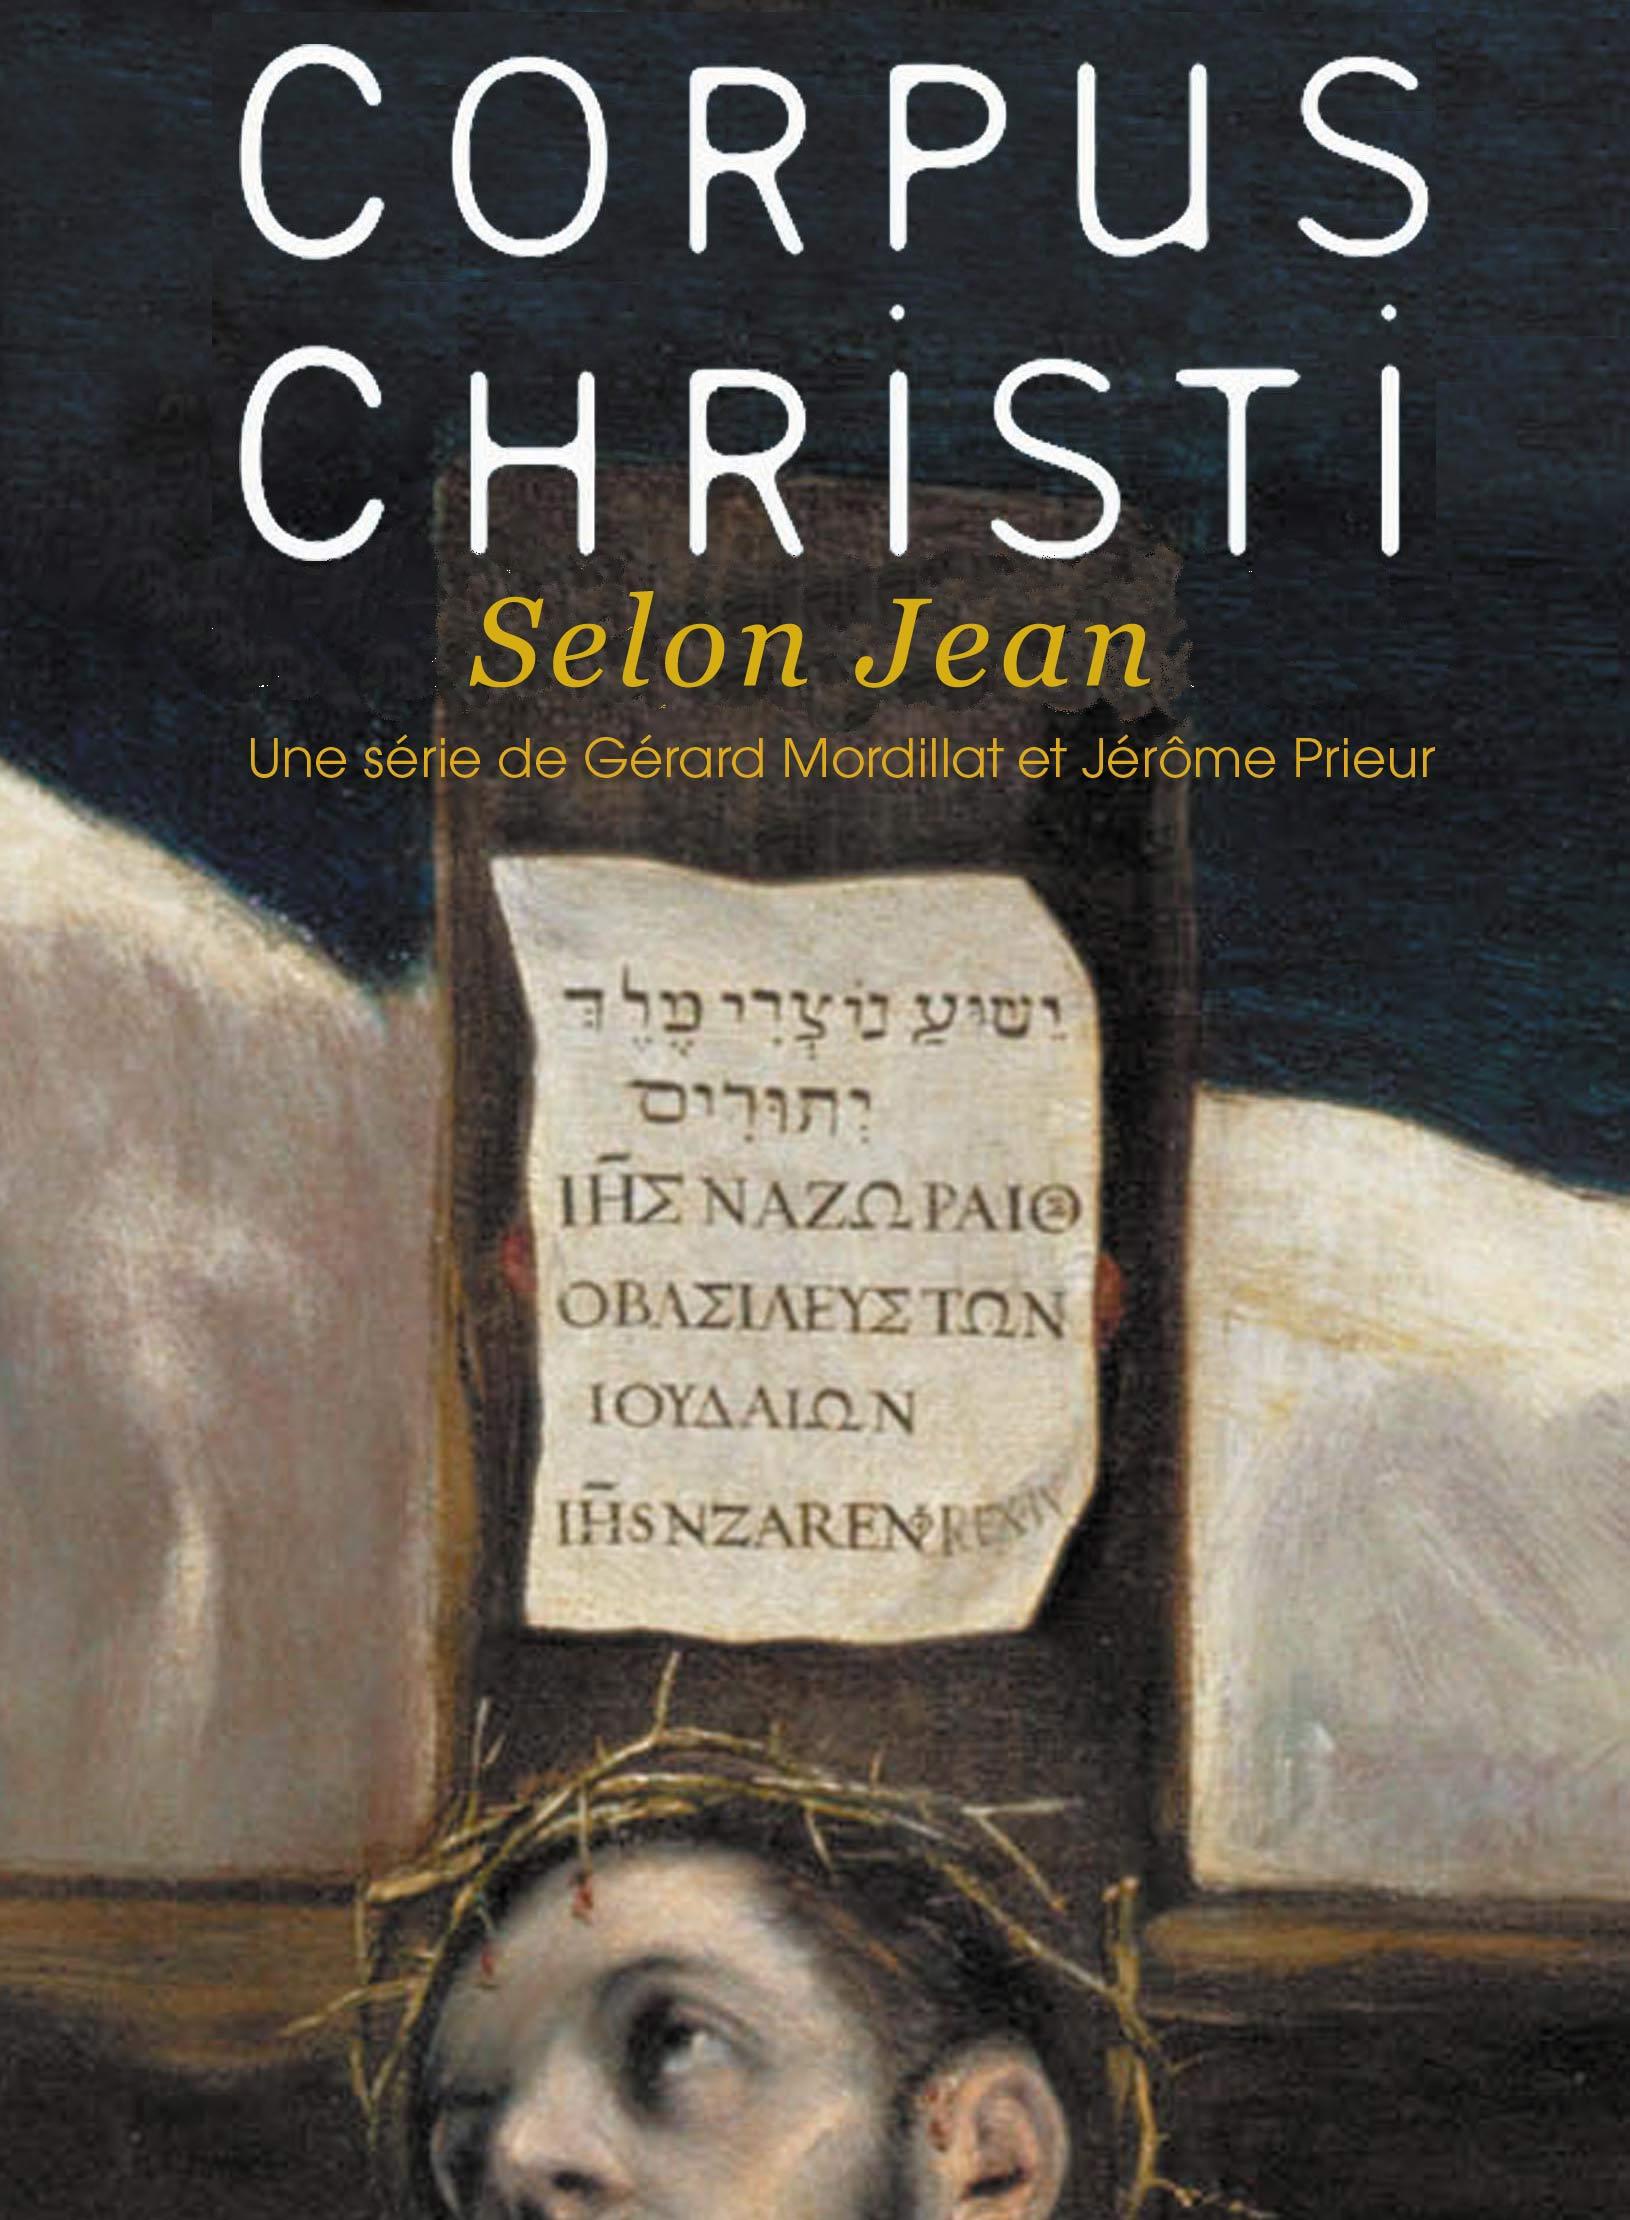 Corpus Christi - Selon Jean | Mordillat, Gérard (Réalisateur)